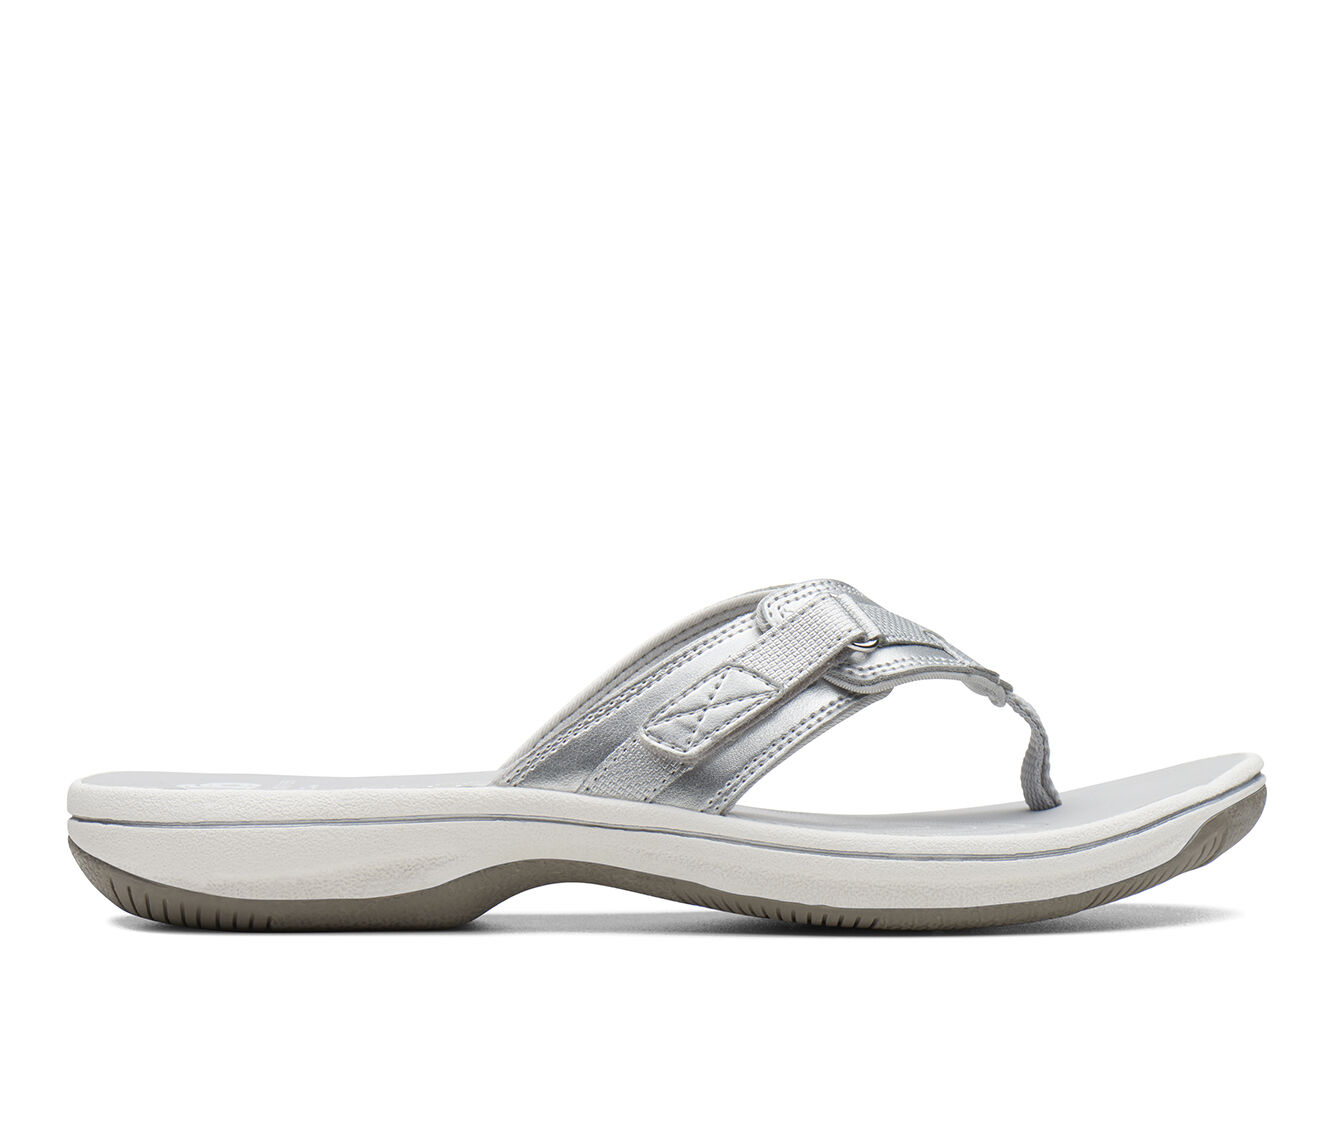 uk shoes_kd5751